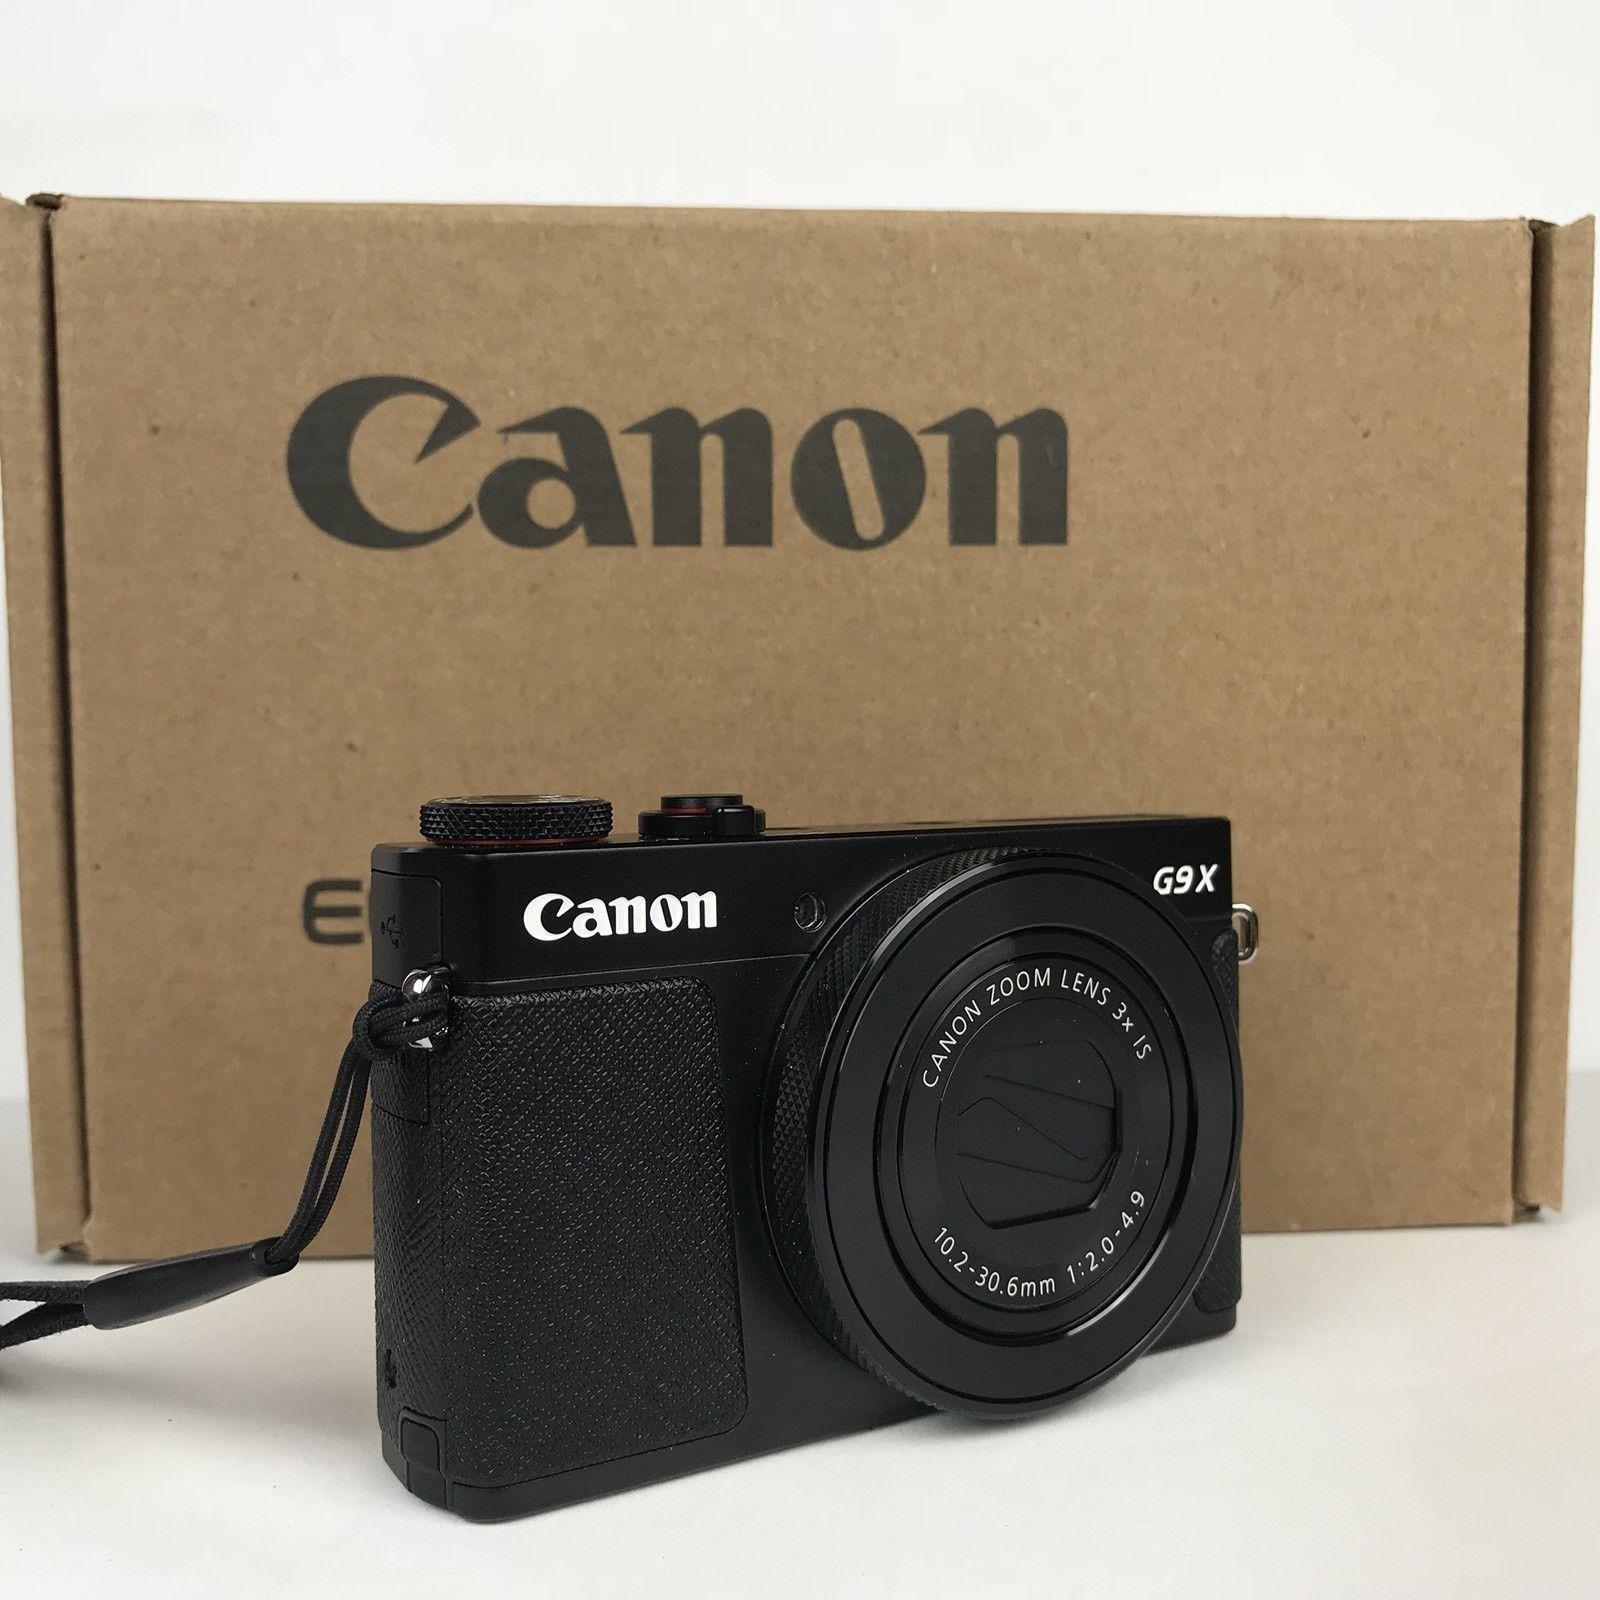 Harga Dan Spek Canon Powershot G9 X Mark Ii Digital Camera Silver Police 14544jsb 02 Merah 201mp Black With Deluxe Carrying Case